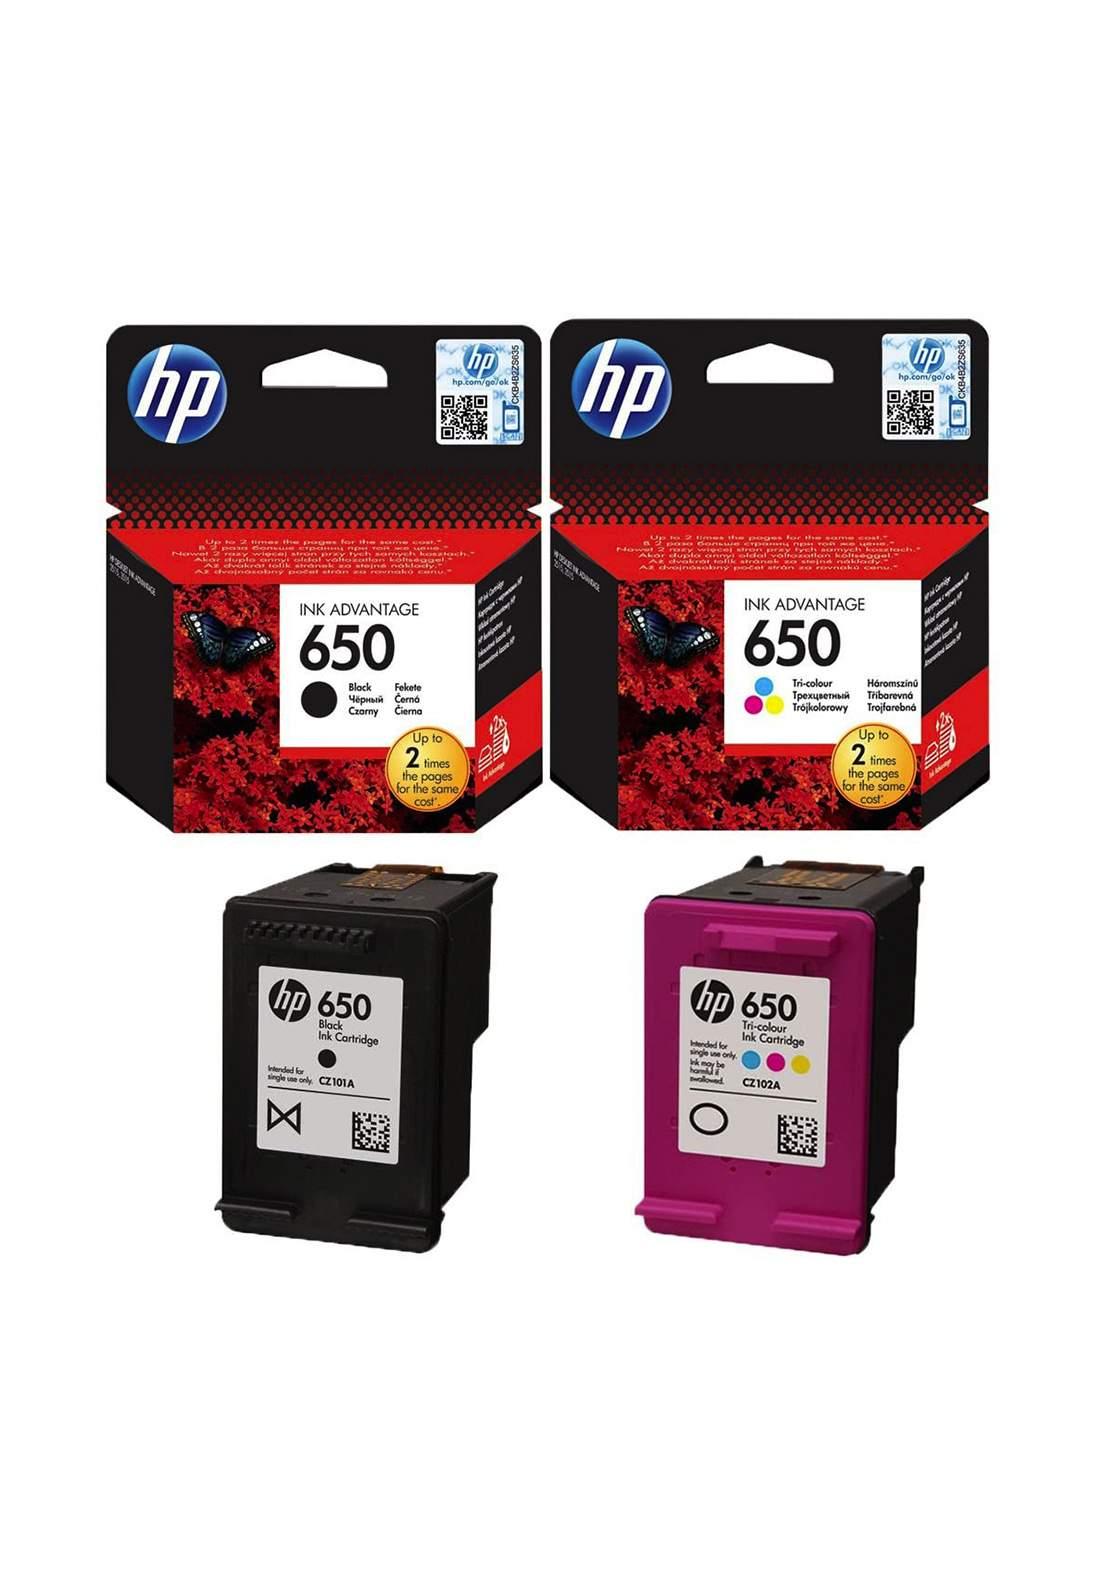 HP 650 Black & Tri-color Original Ink Advantage Cartridge Set  خرطوشة حبر